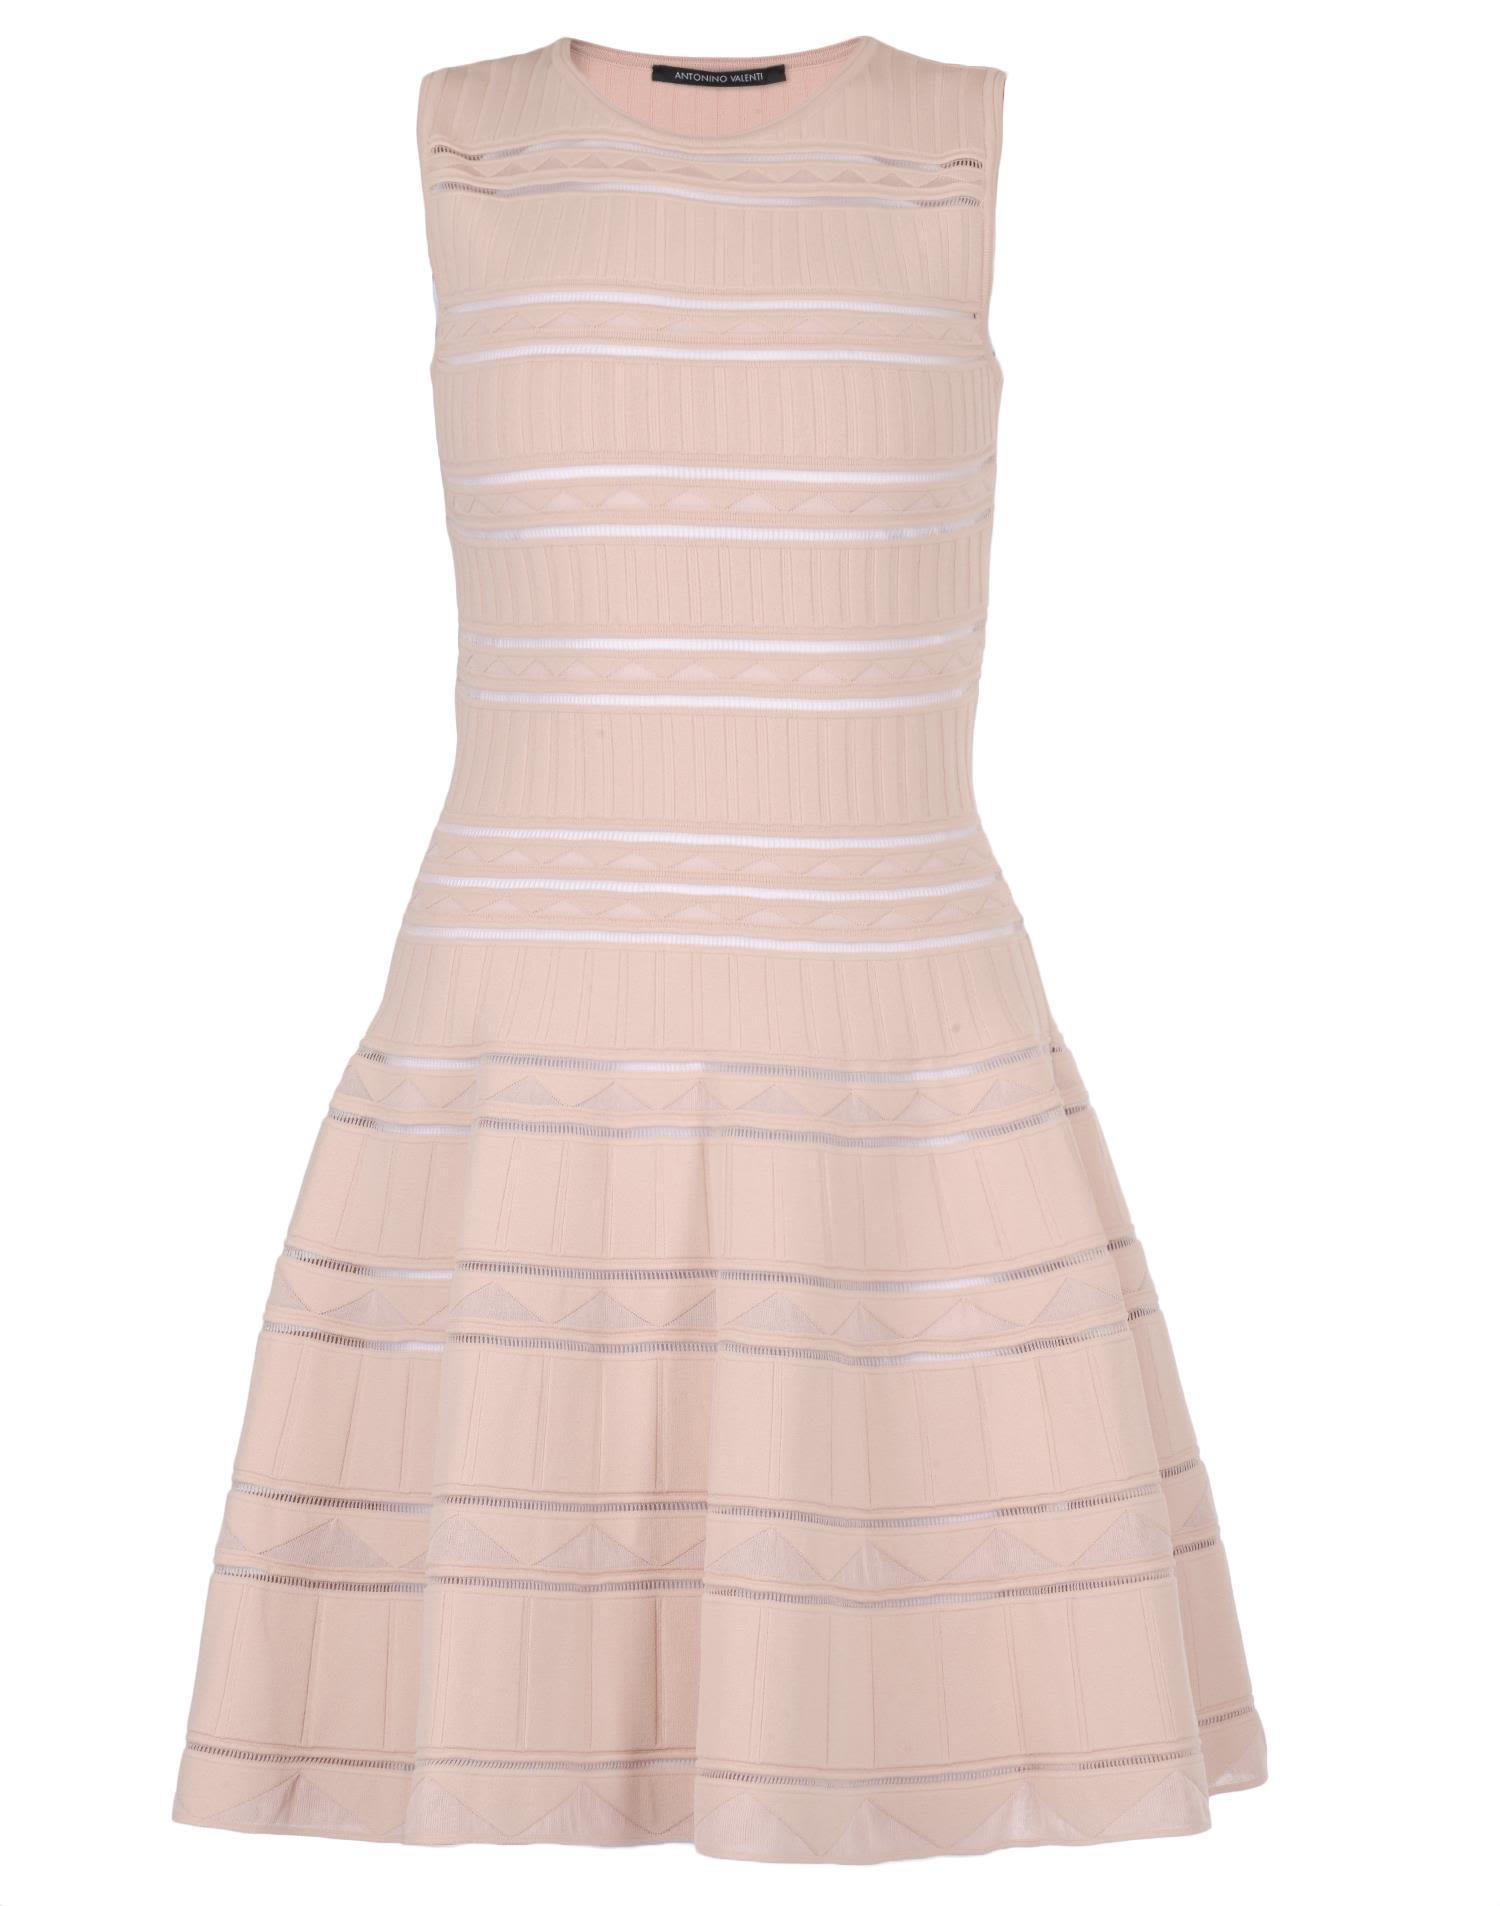 Antonino Valenti Plain Color Dress